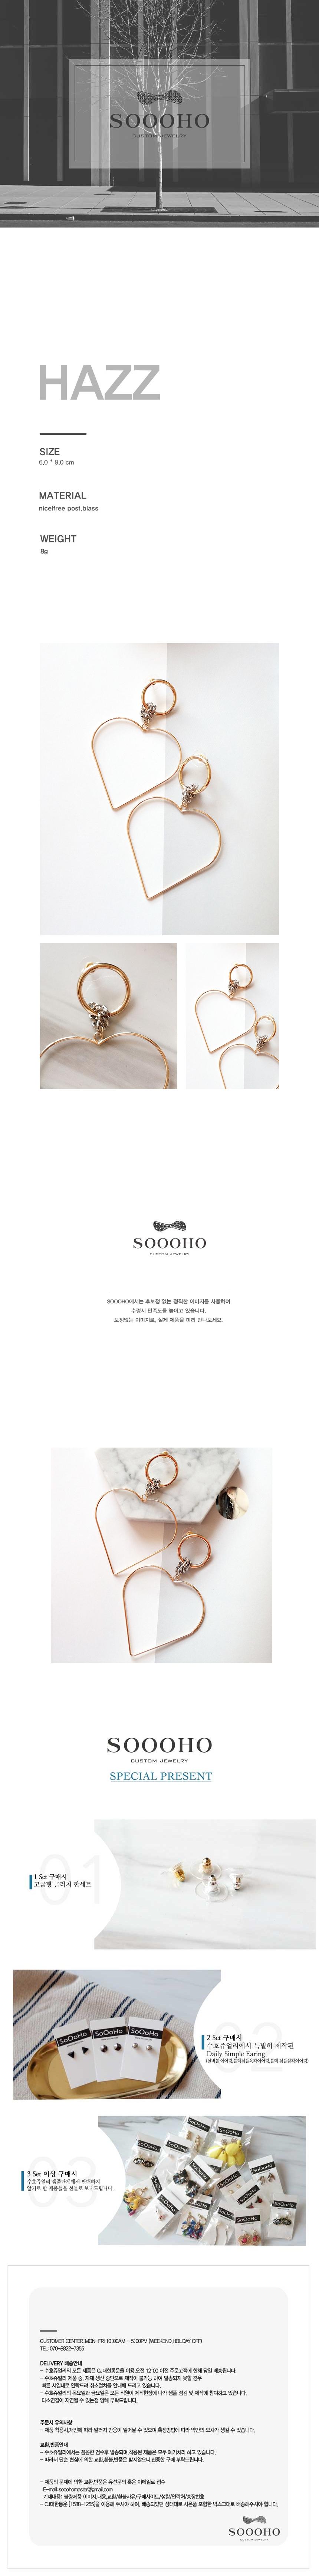 hazz 하트 포인트 볼드 디스코귀걸이 - 수호쥬얼리, 15,500원, 골드, 드롭귀걸이